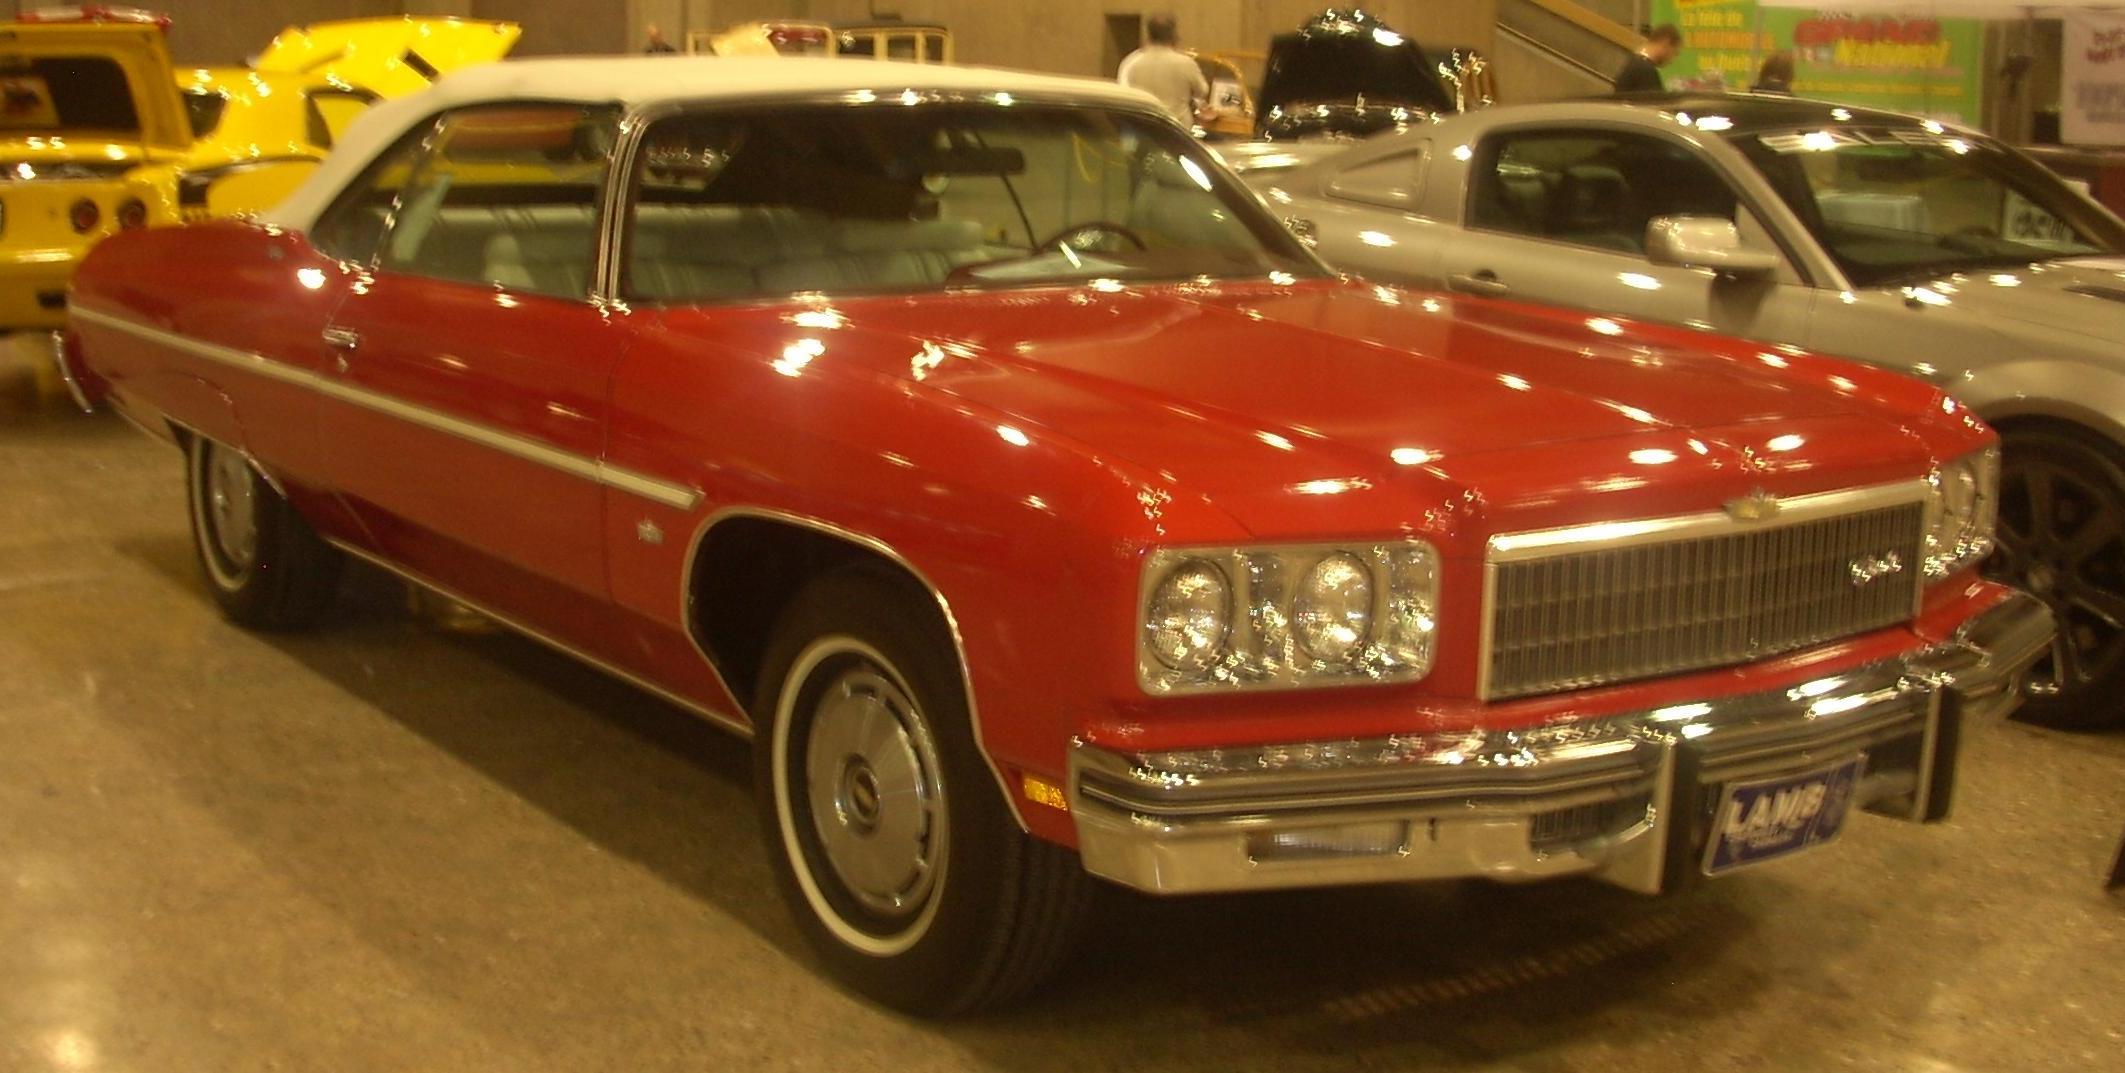 File:'75 Chevrolet Caprice Clic Convertible (Auto clique).jpg ...